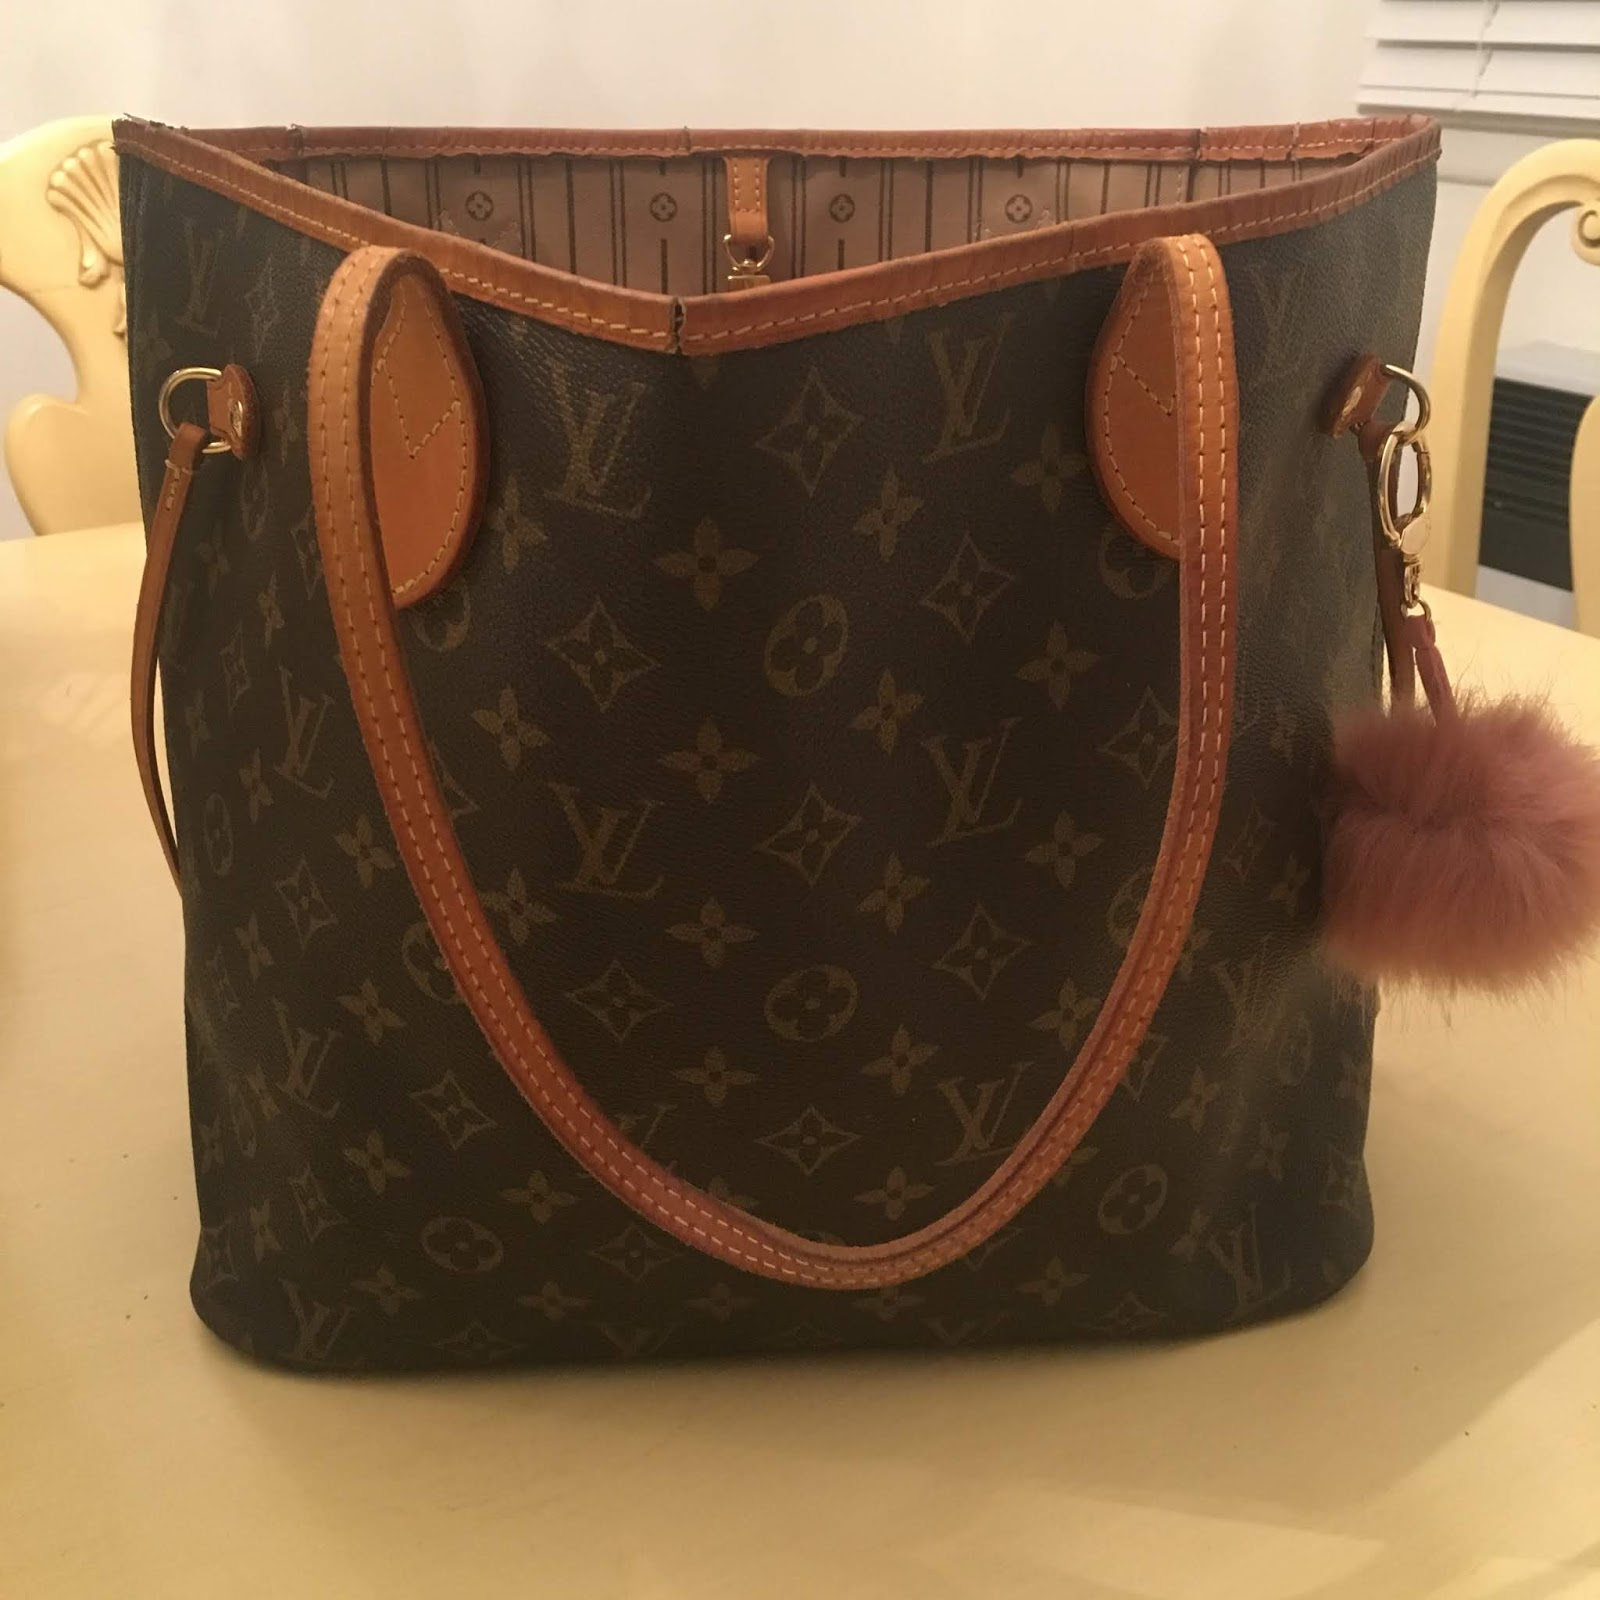 51d1f910a46f Handbag Review  Louis Vuitton Neverfull MM - Royally Pink